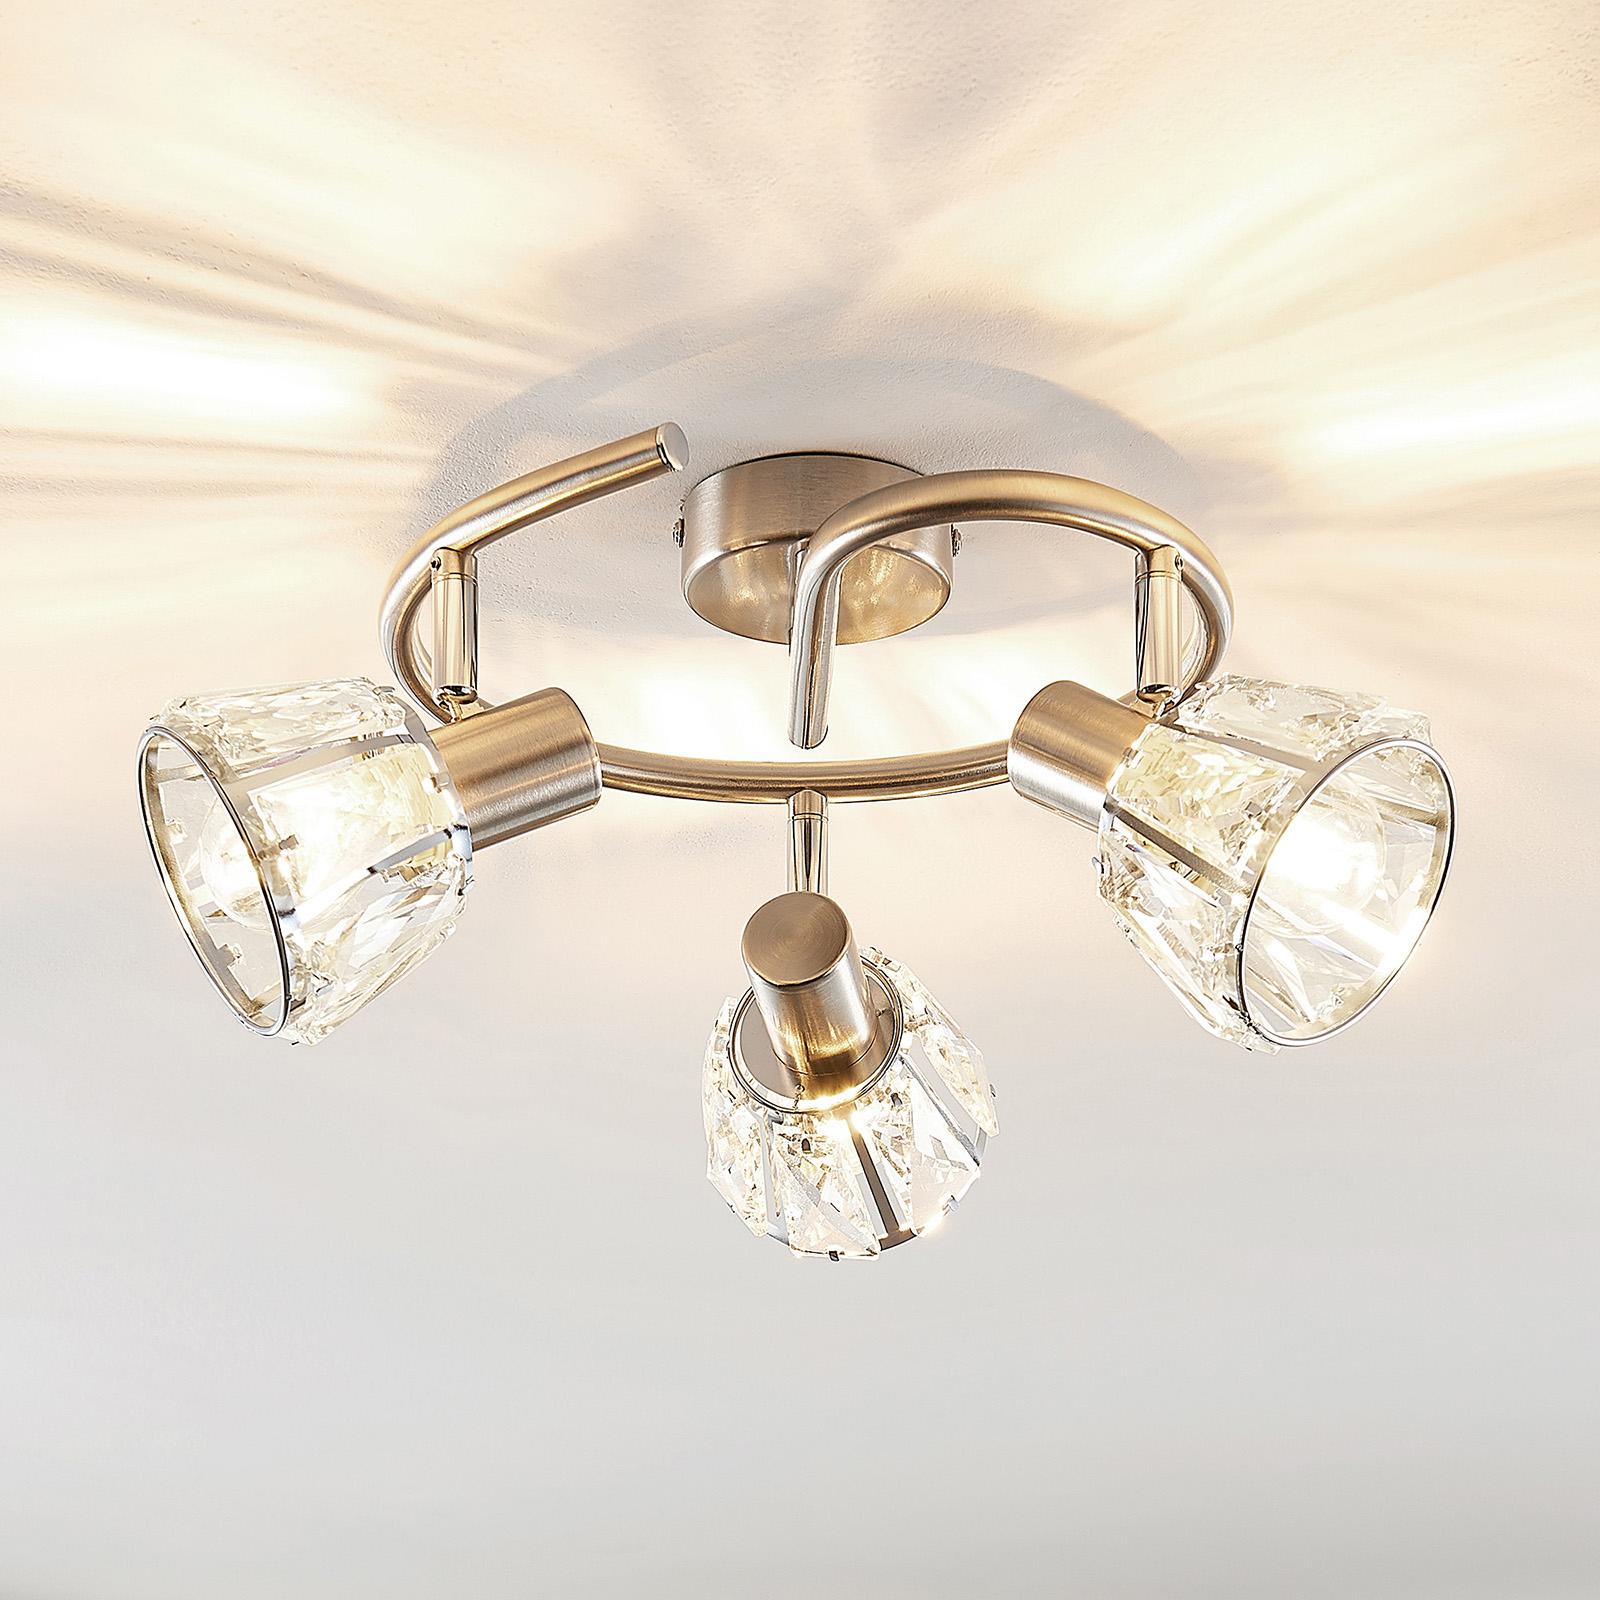 Lindby Kosta lampa sufitowa, 3-punktowa, nikiel